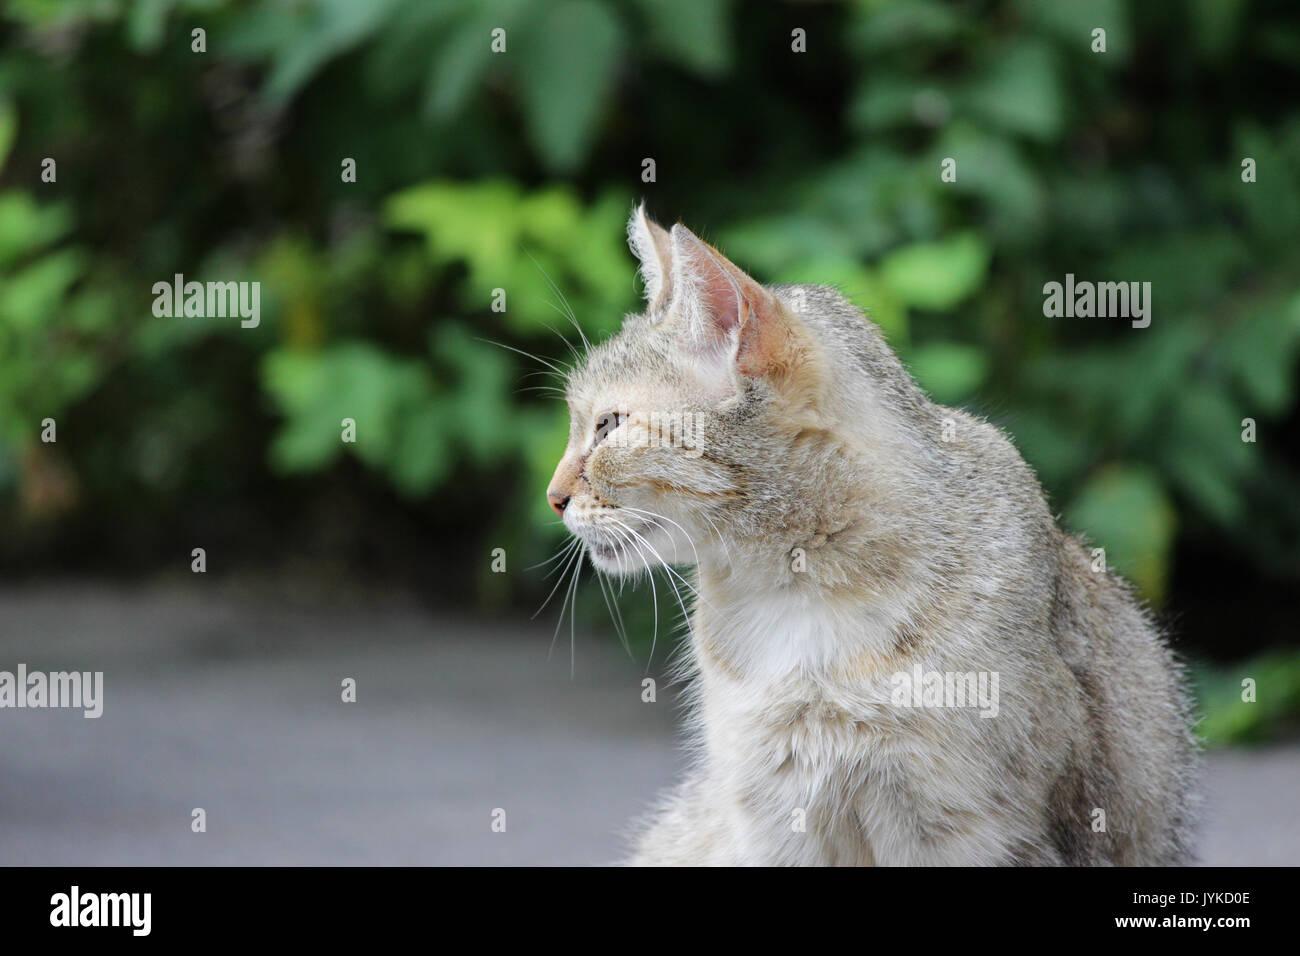 Feline Herpes Virus Natural Treatment